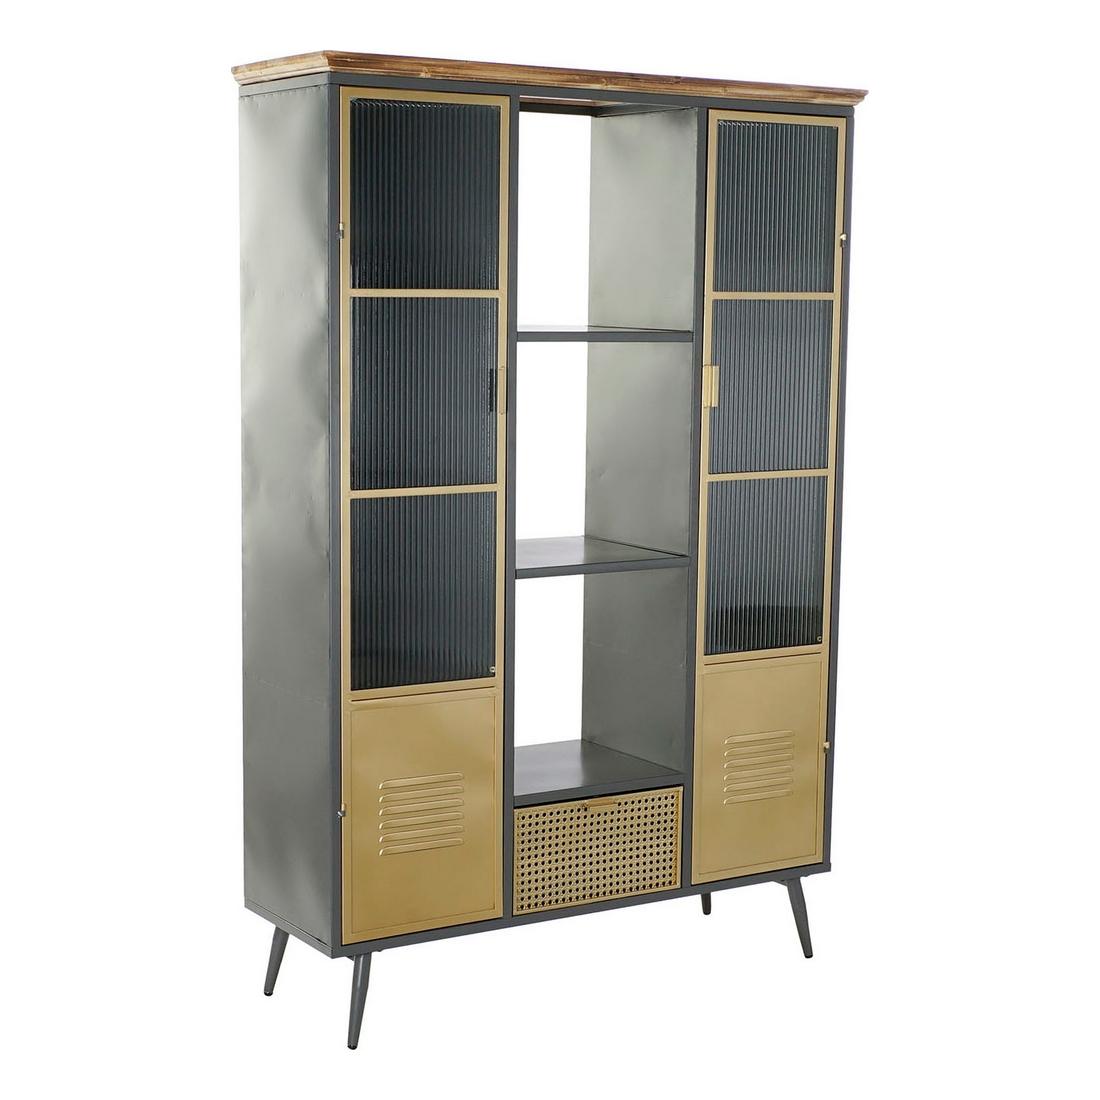 Bookshop DKD Home Decor Metal Crystal (122 x 40 x 182 cm)